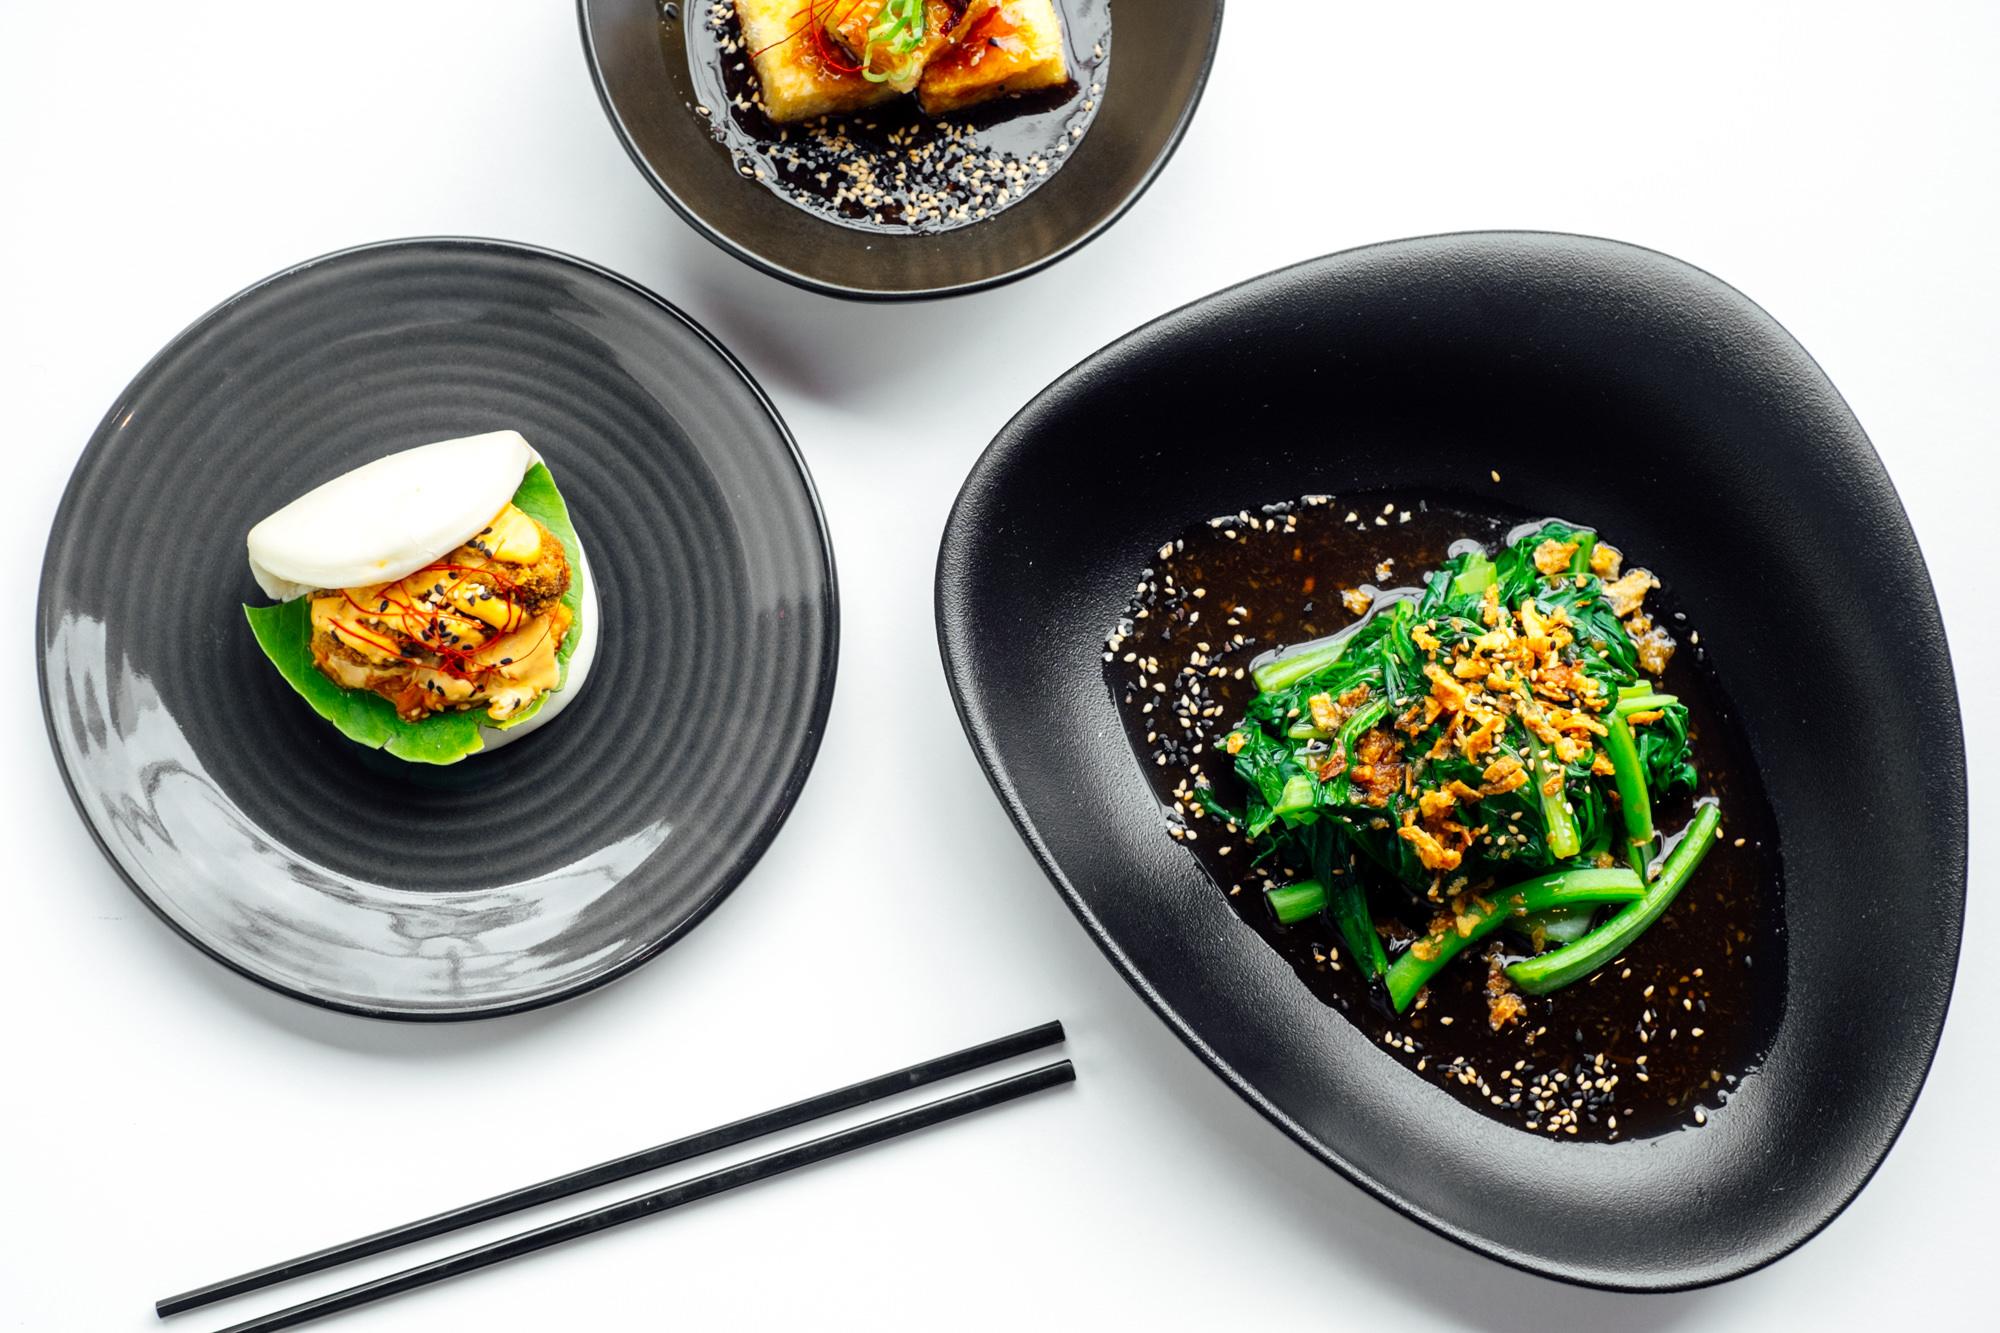 Punters can look forward to an expanded Brisbane menu, including Panko-Crumbed Mushroom & Kimchi Bao, Agedashi Tofu in Shiitake Dashi, Asian greens in ginger and garlic dressing and more. Photos: Adam Hunter